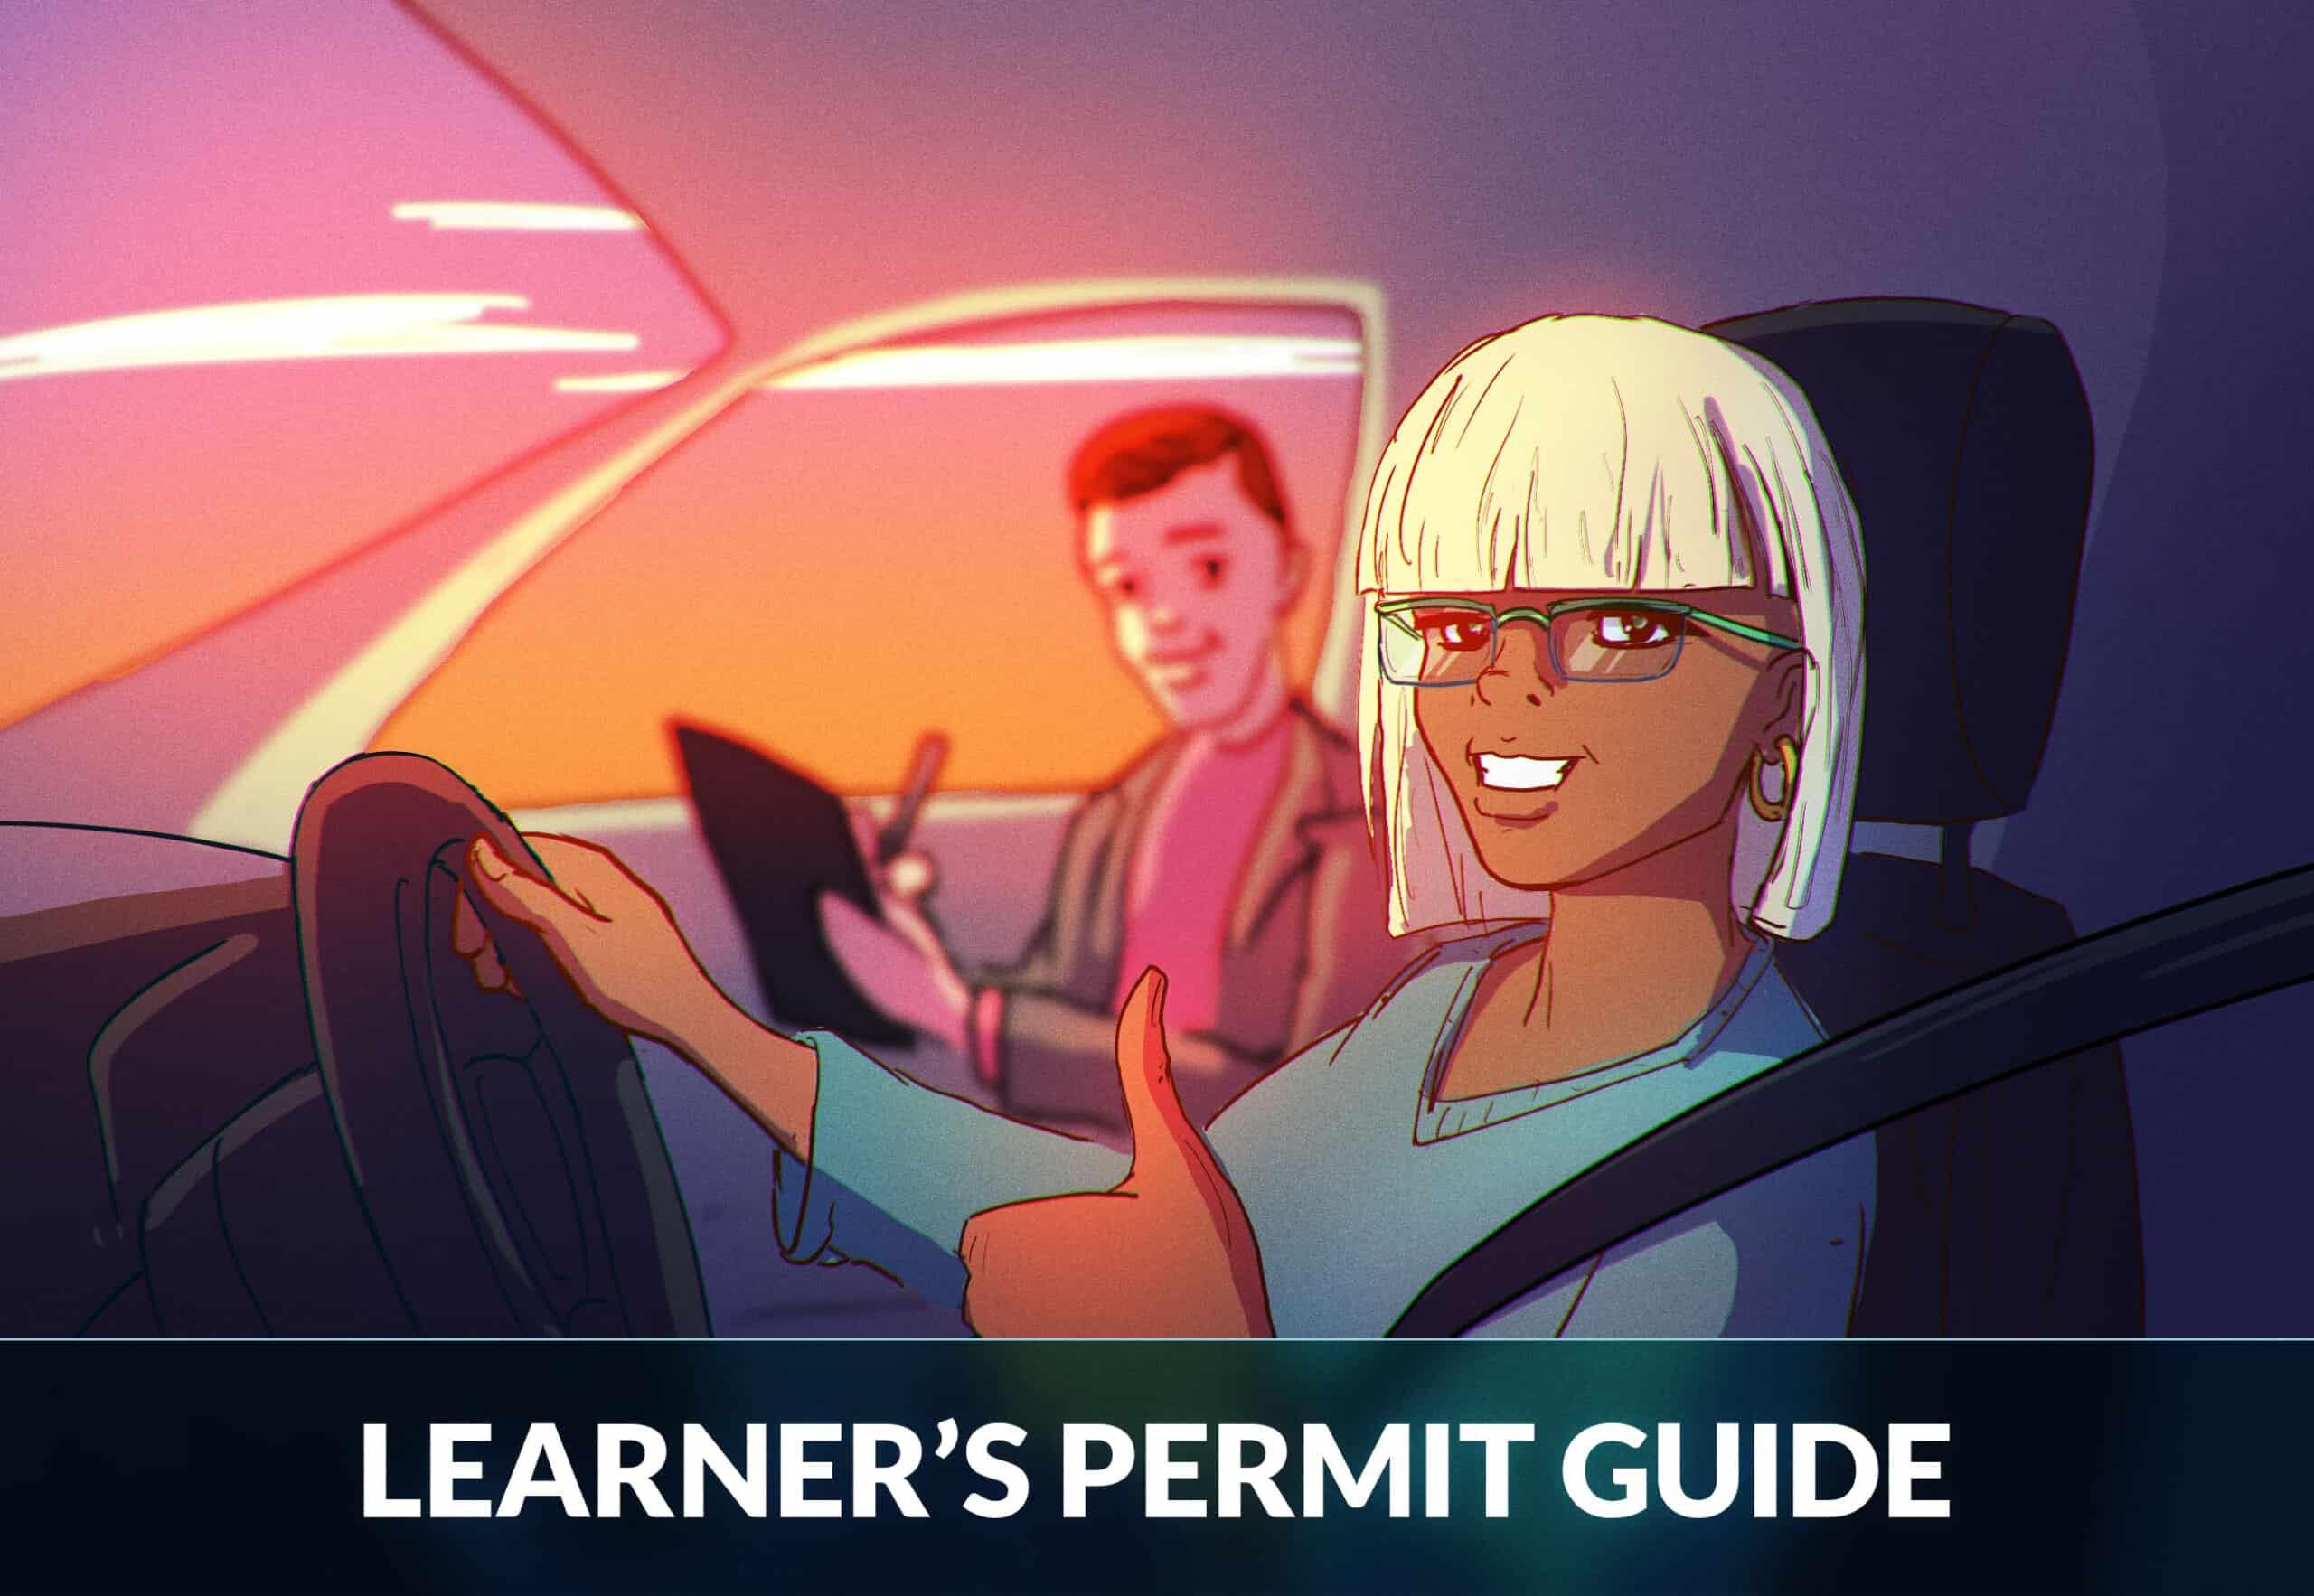 DMV Learner's Permit: The Ultimate 2021 Guide